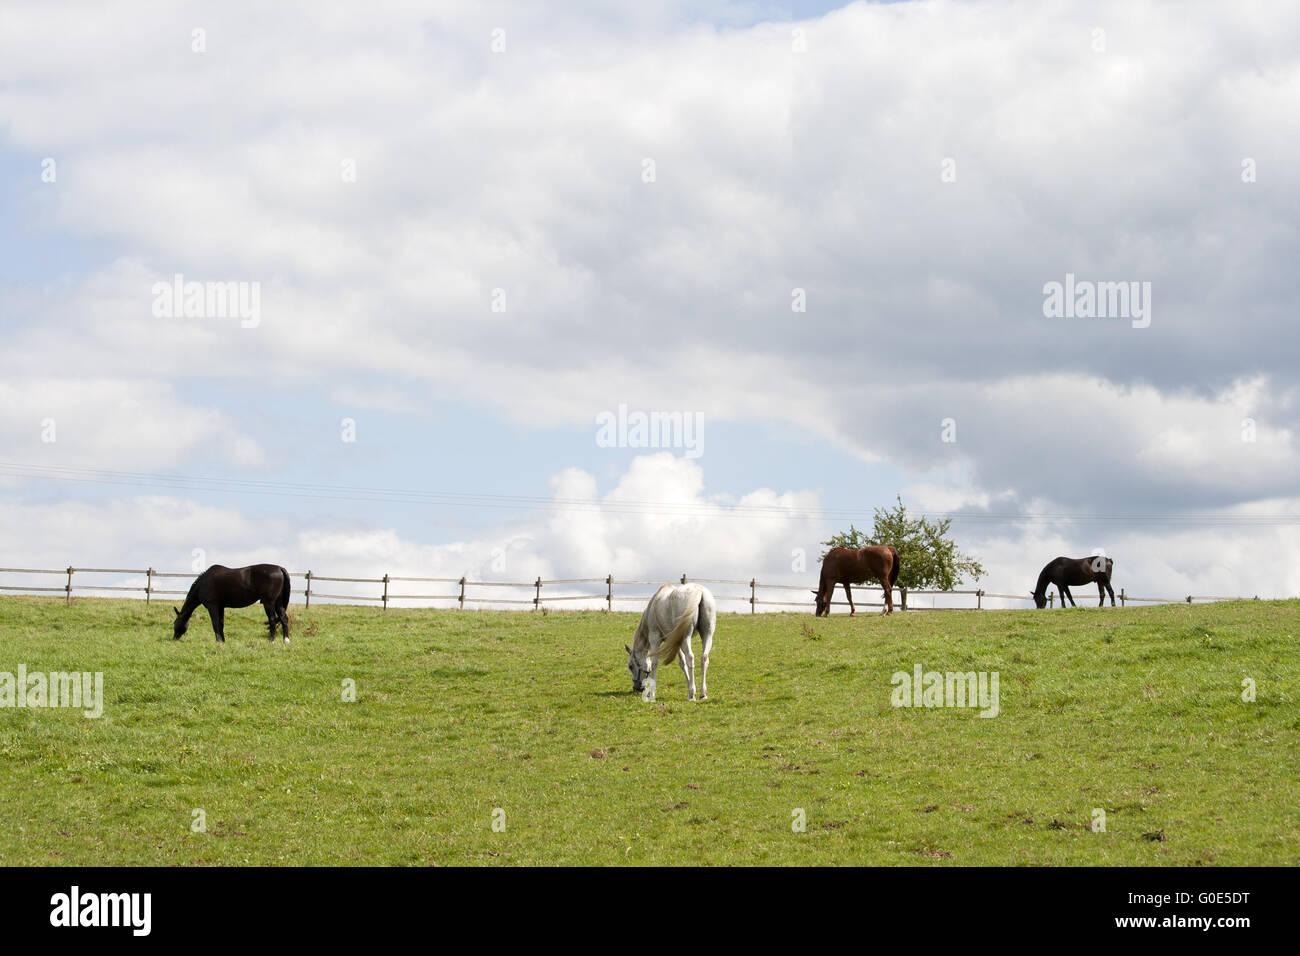 Horses grazing free on paddock - Stock Image